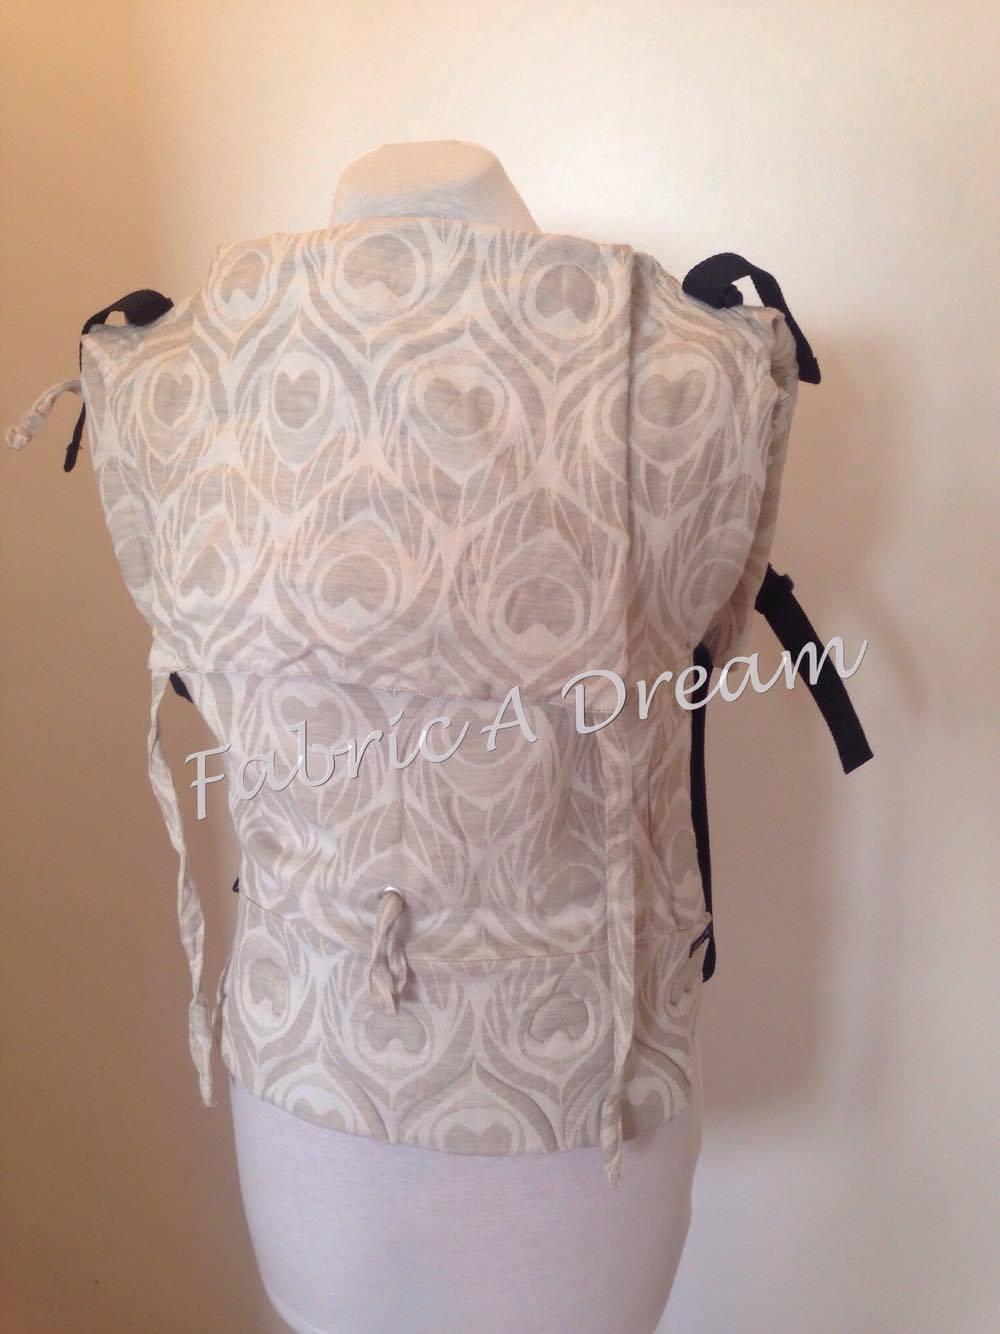 Fabric-a-dream